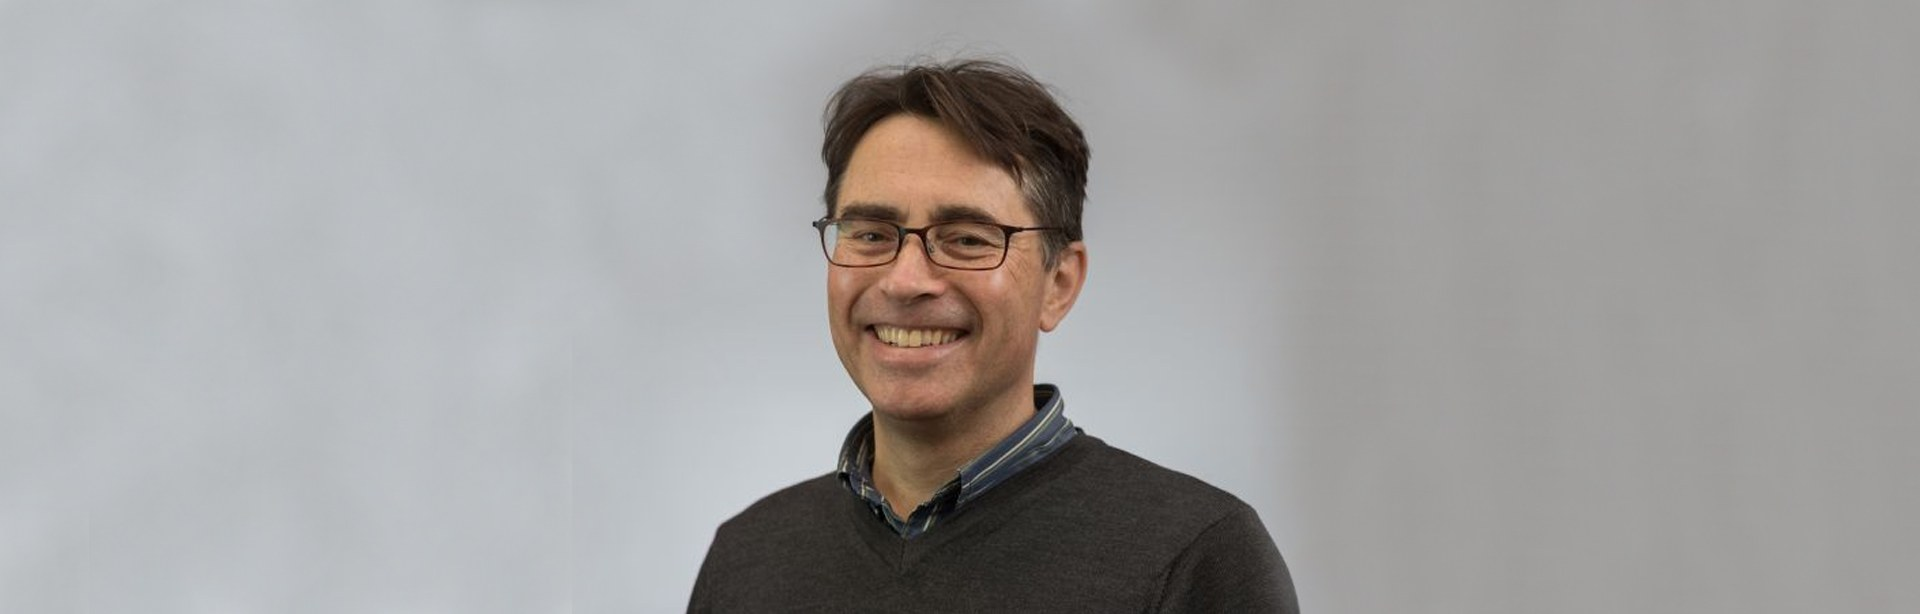 Andrew Calway, University of Bristol